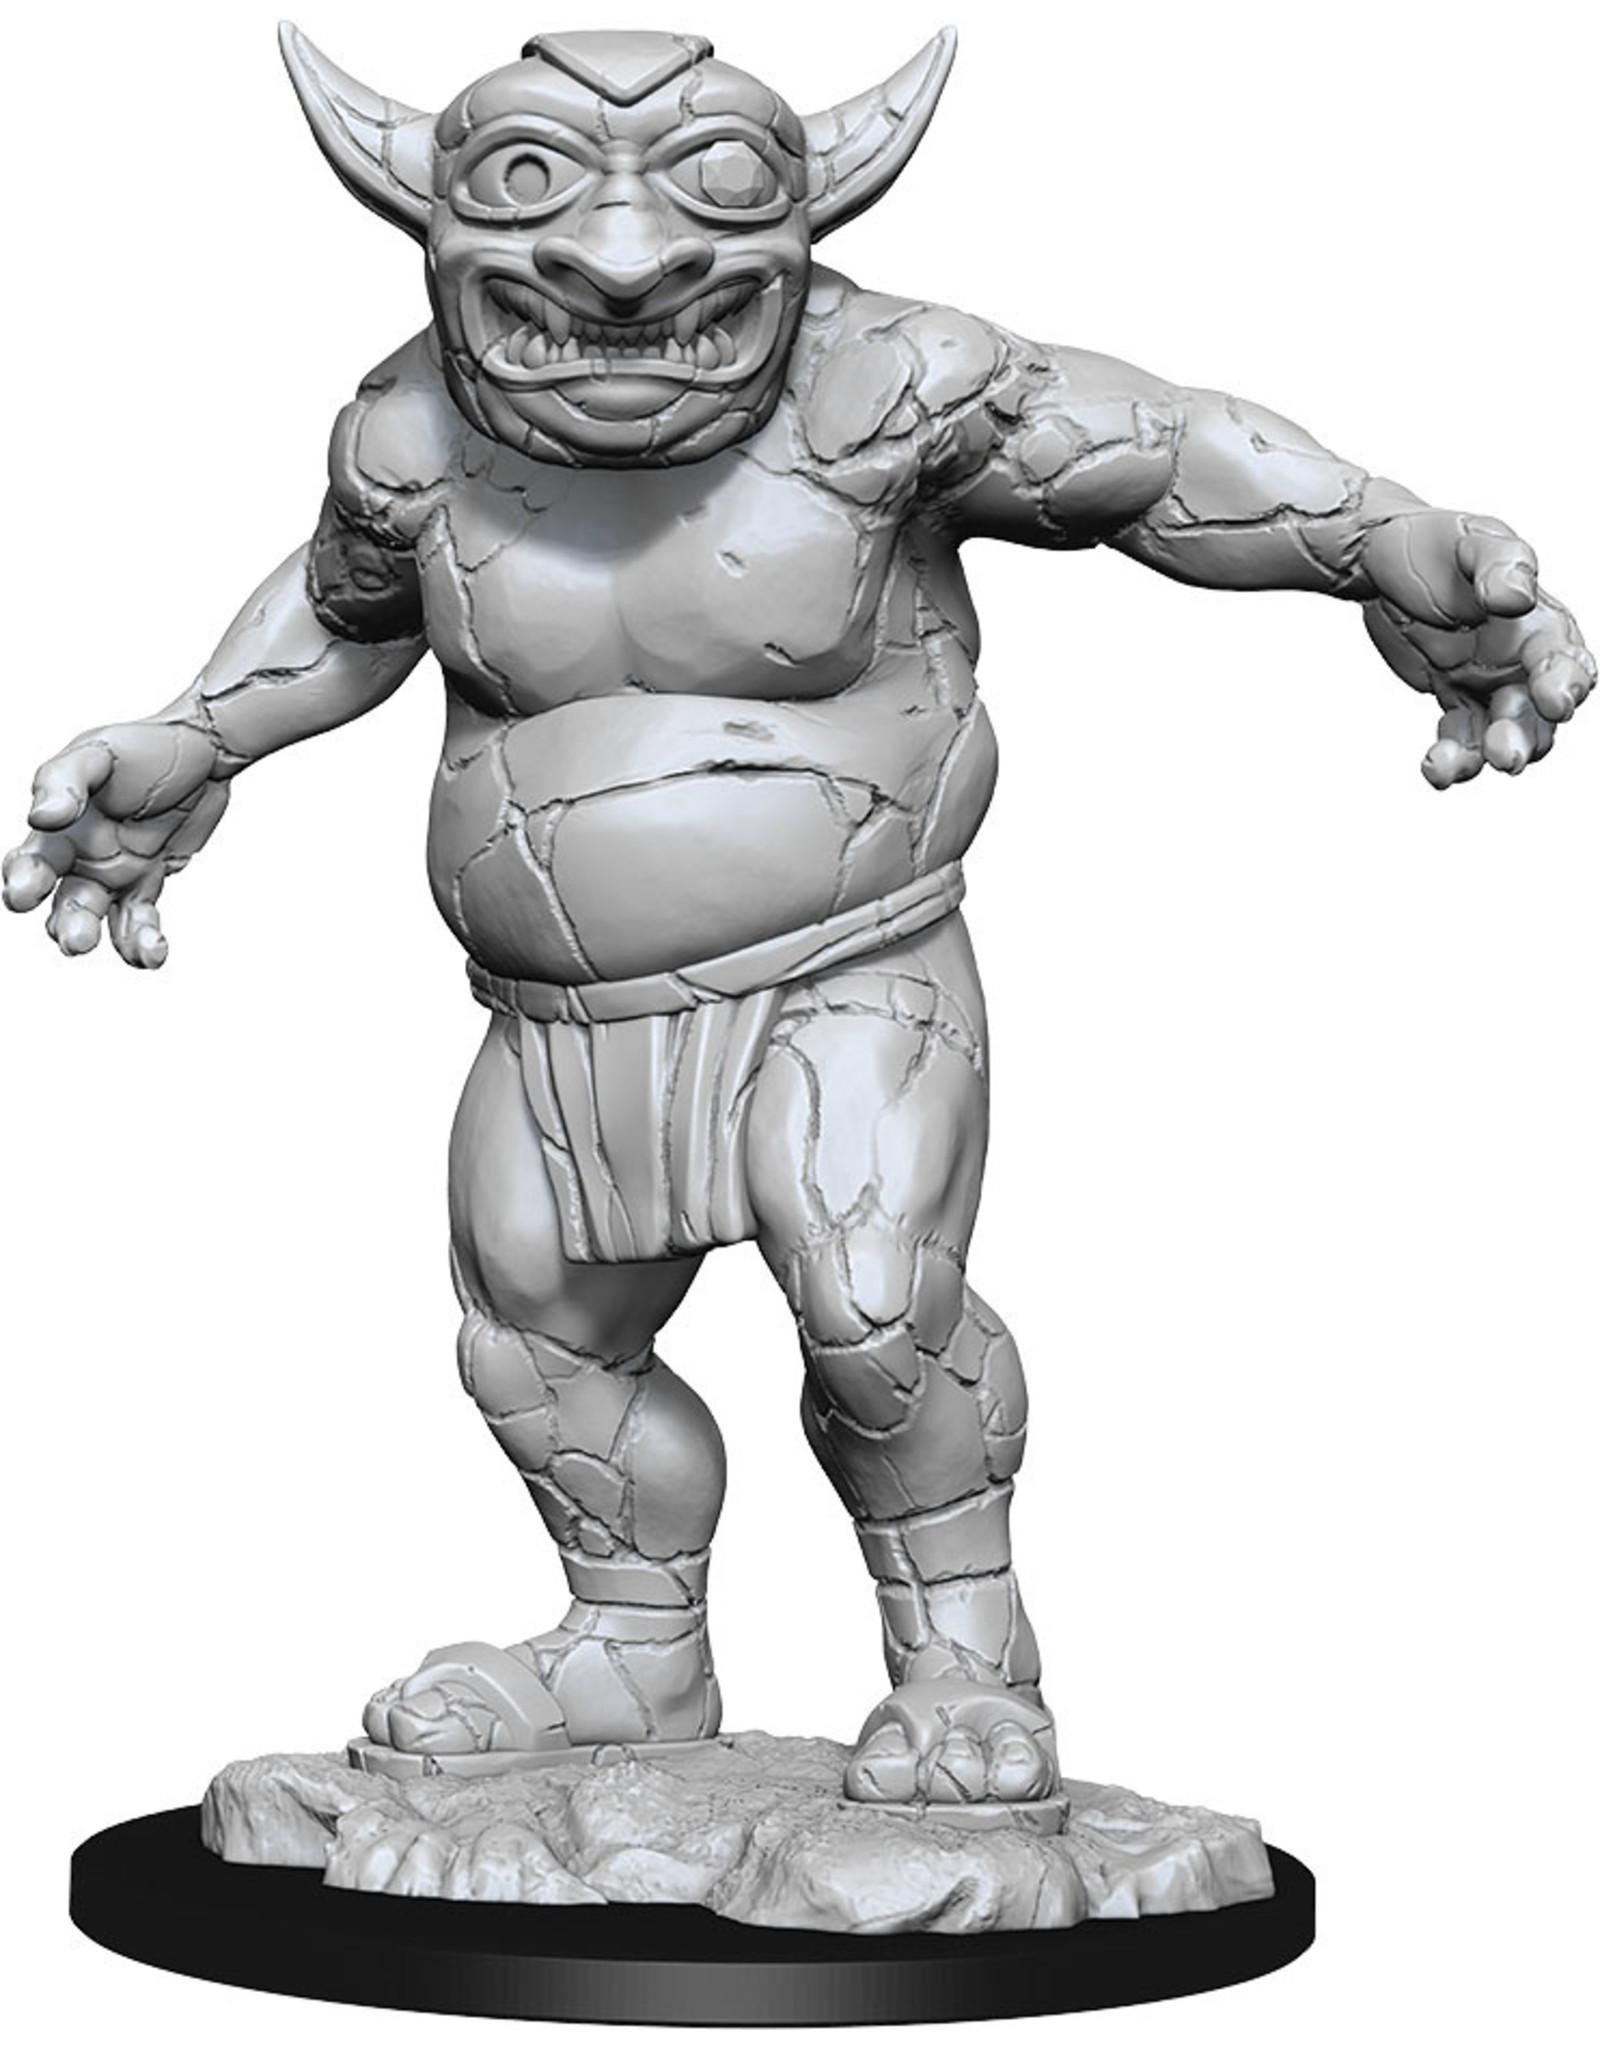 Wiz Kids D&D Nolzur's MUM: W13 Eidolon Possessed Sacred Statue